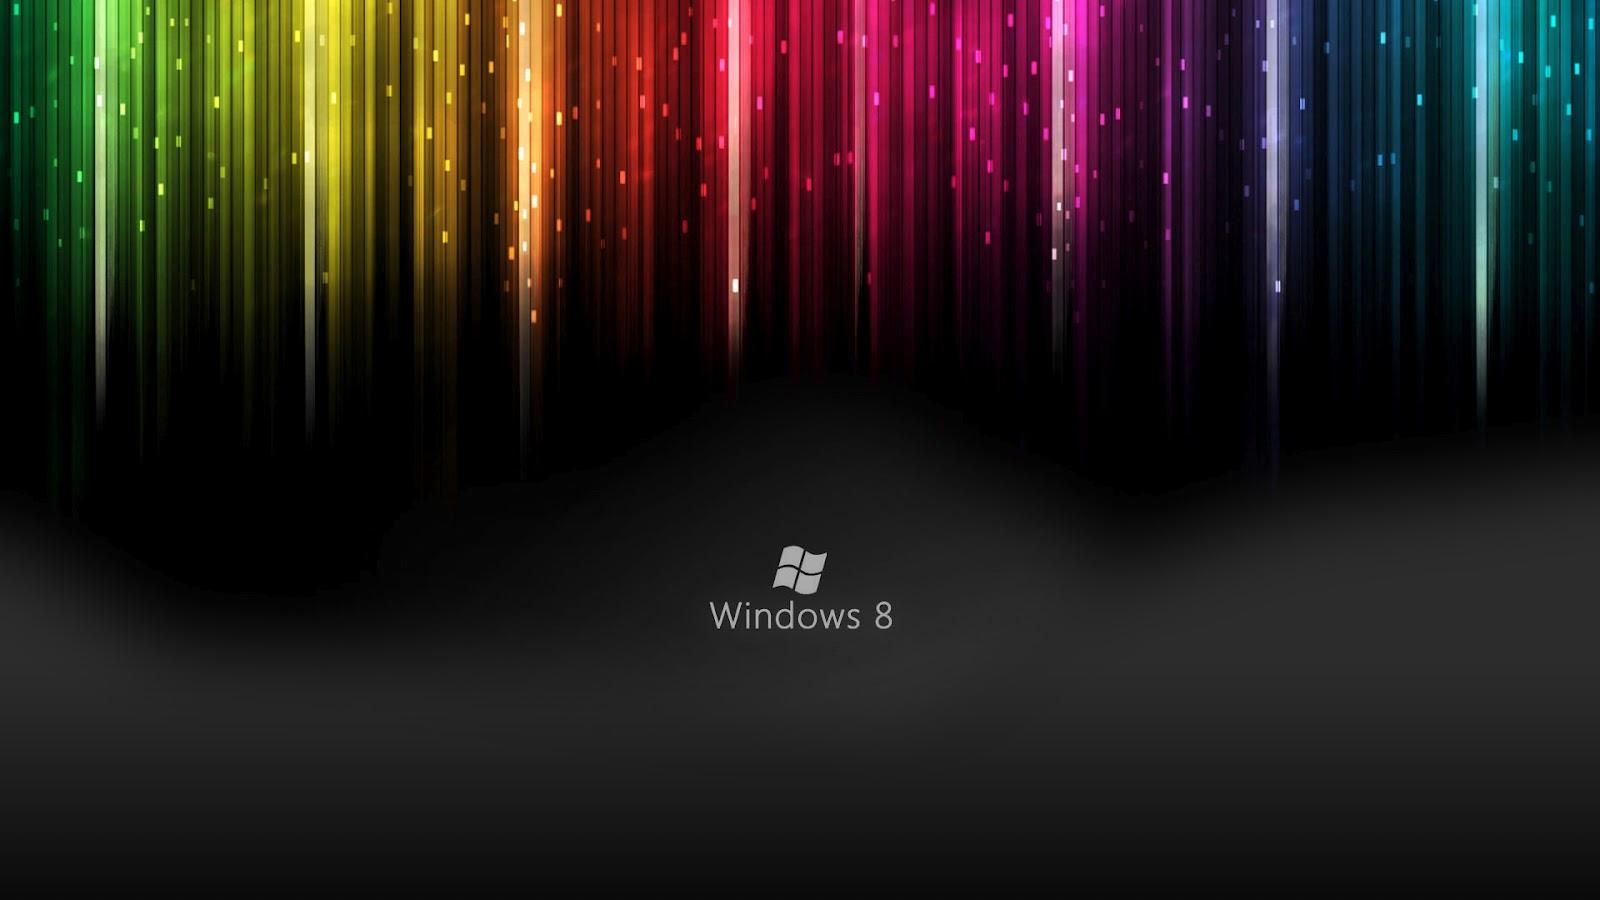 Windows8Hd1080Wallpaper44jpg 1600x900